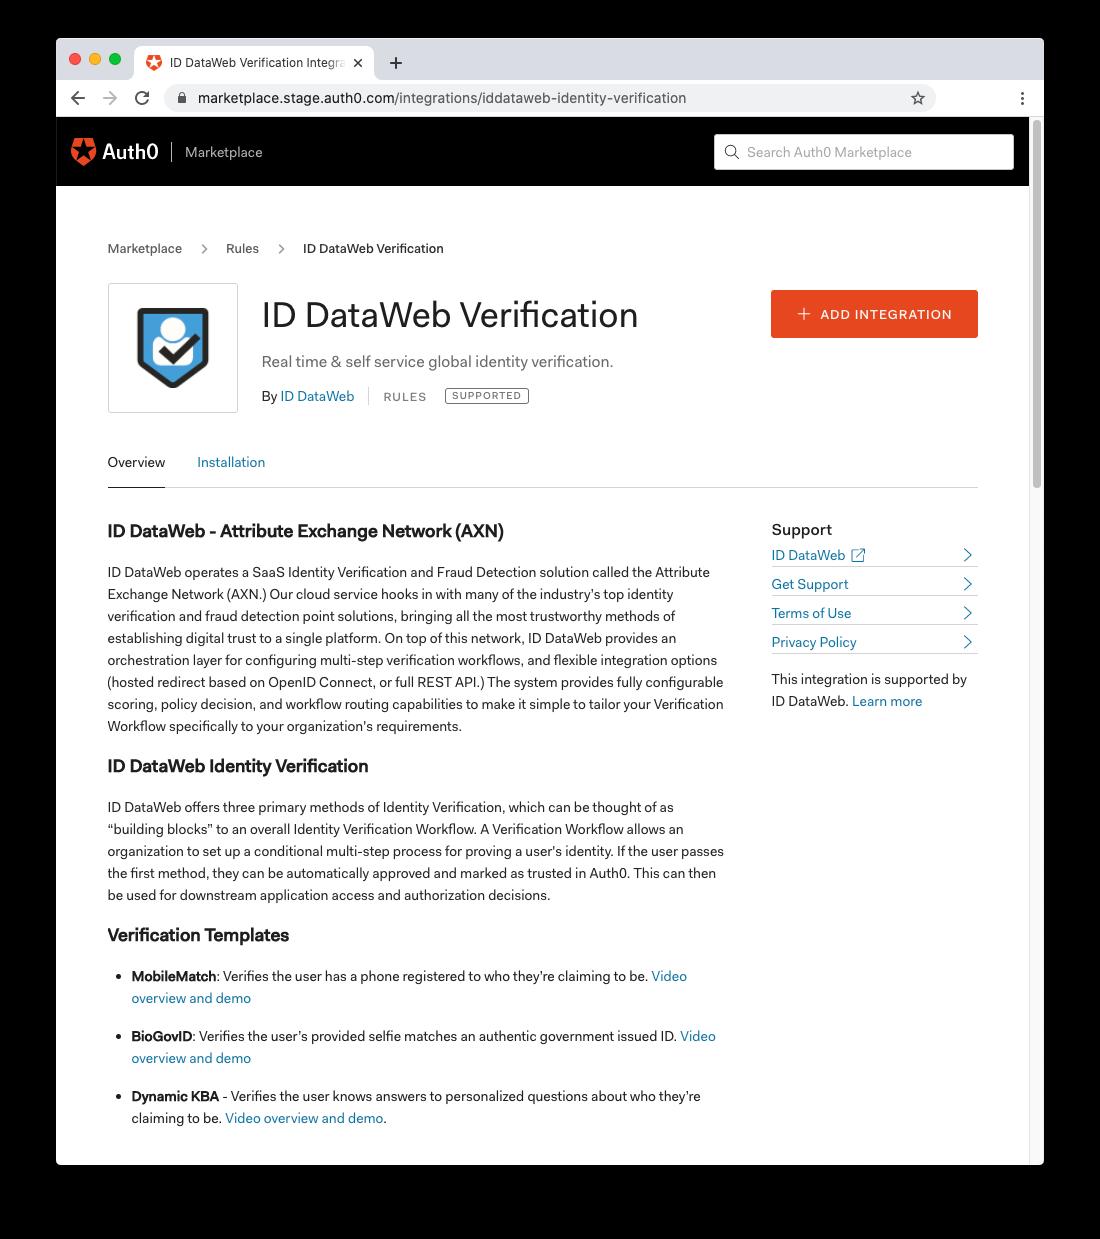 ID DataWeb Verification